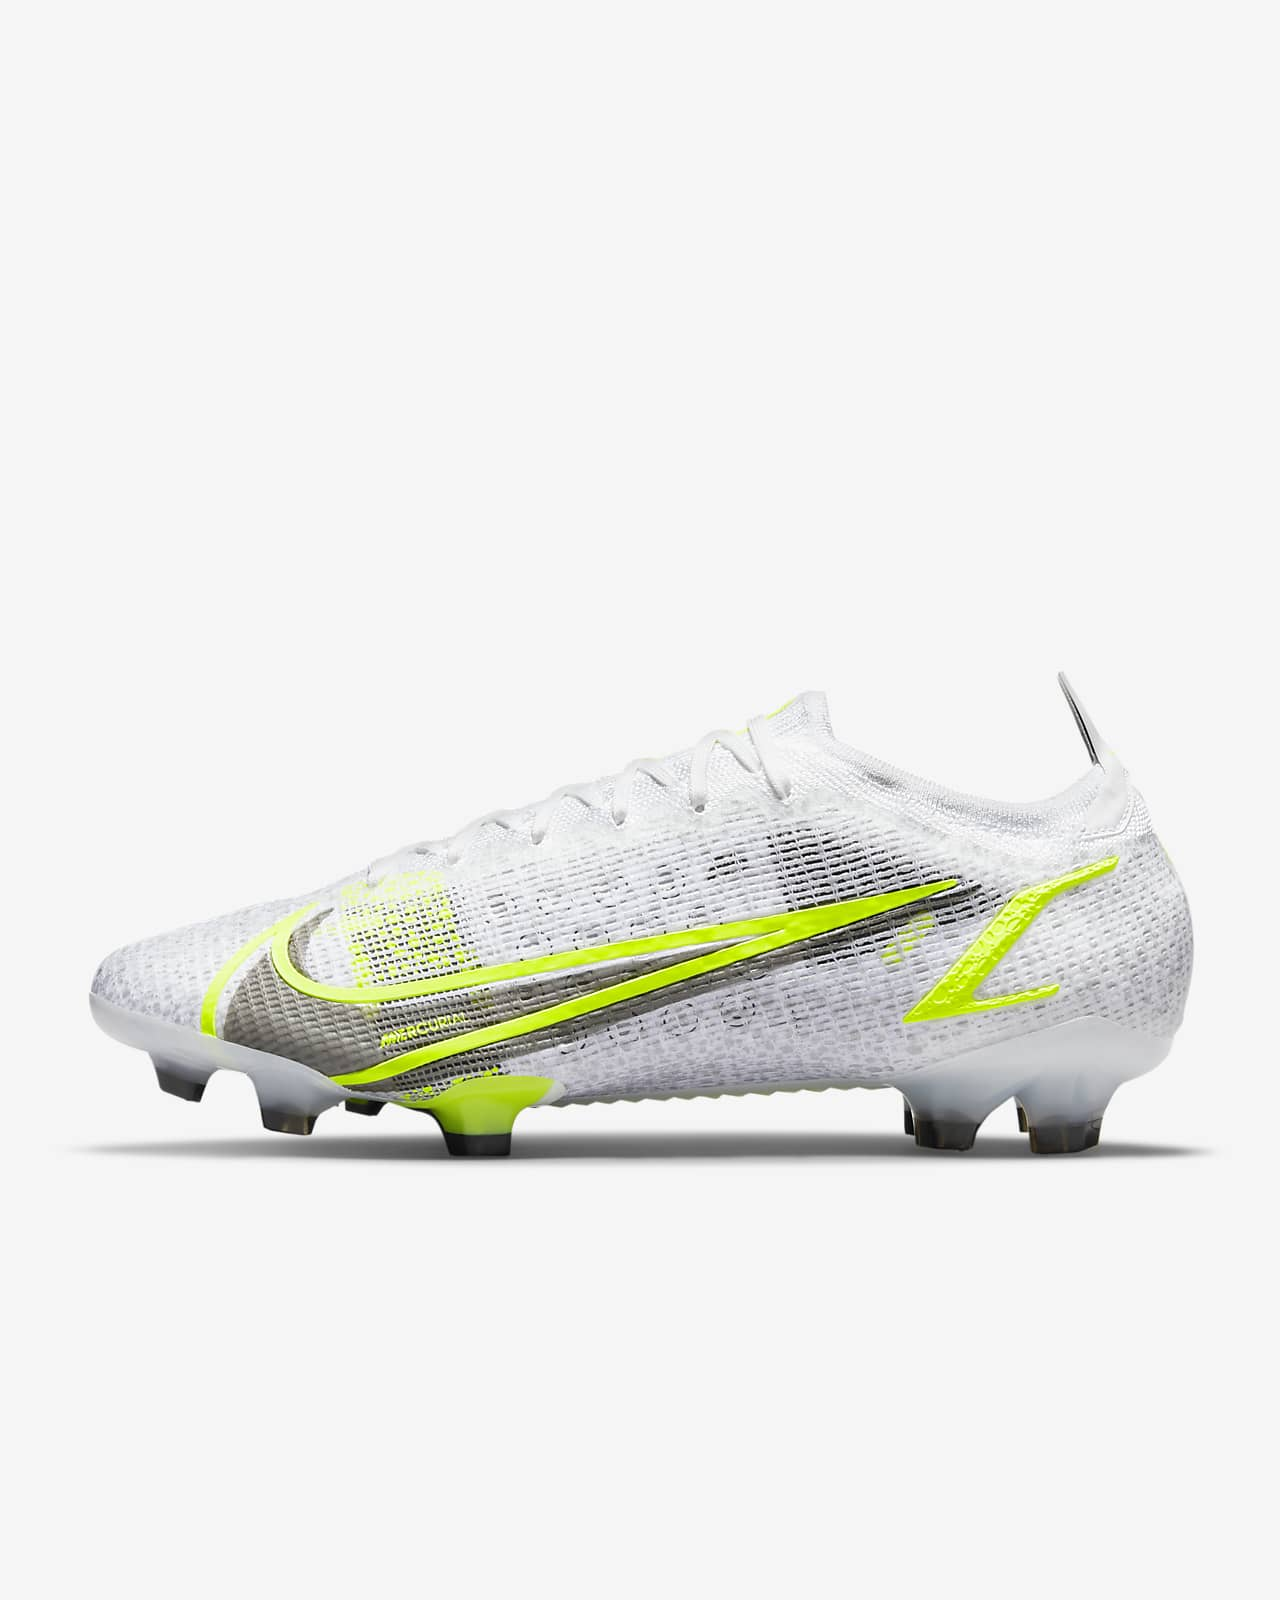 Nike Mercurial Vapor 14 Elite FG 天然偏硬草地足球釘鞋